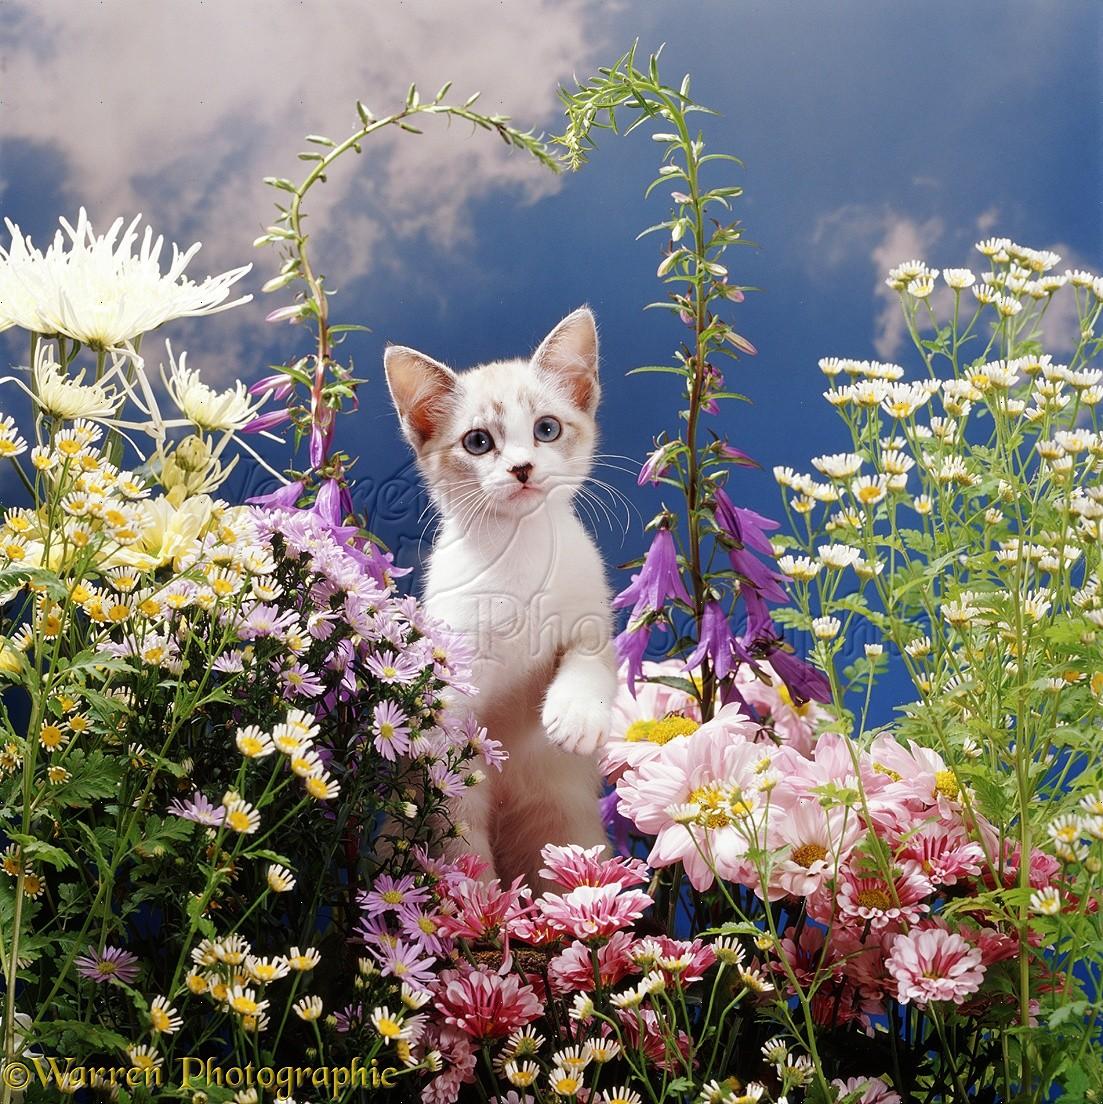 Kitten Among Flowers Photo Wp08195